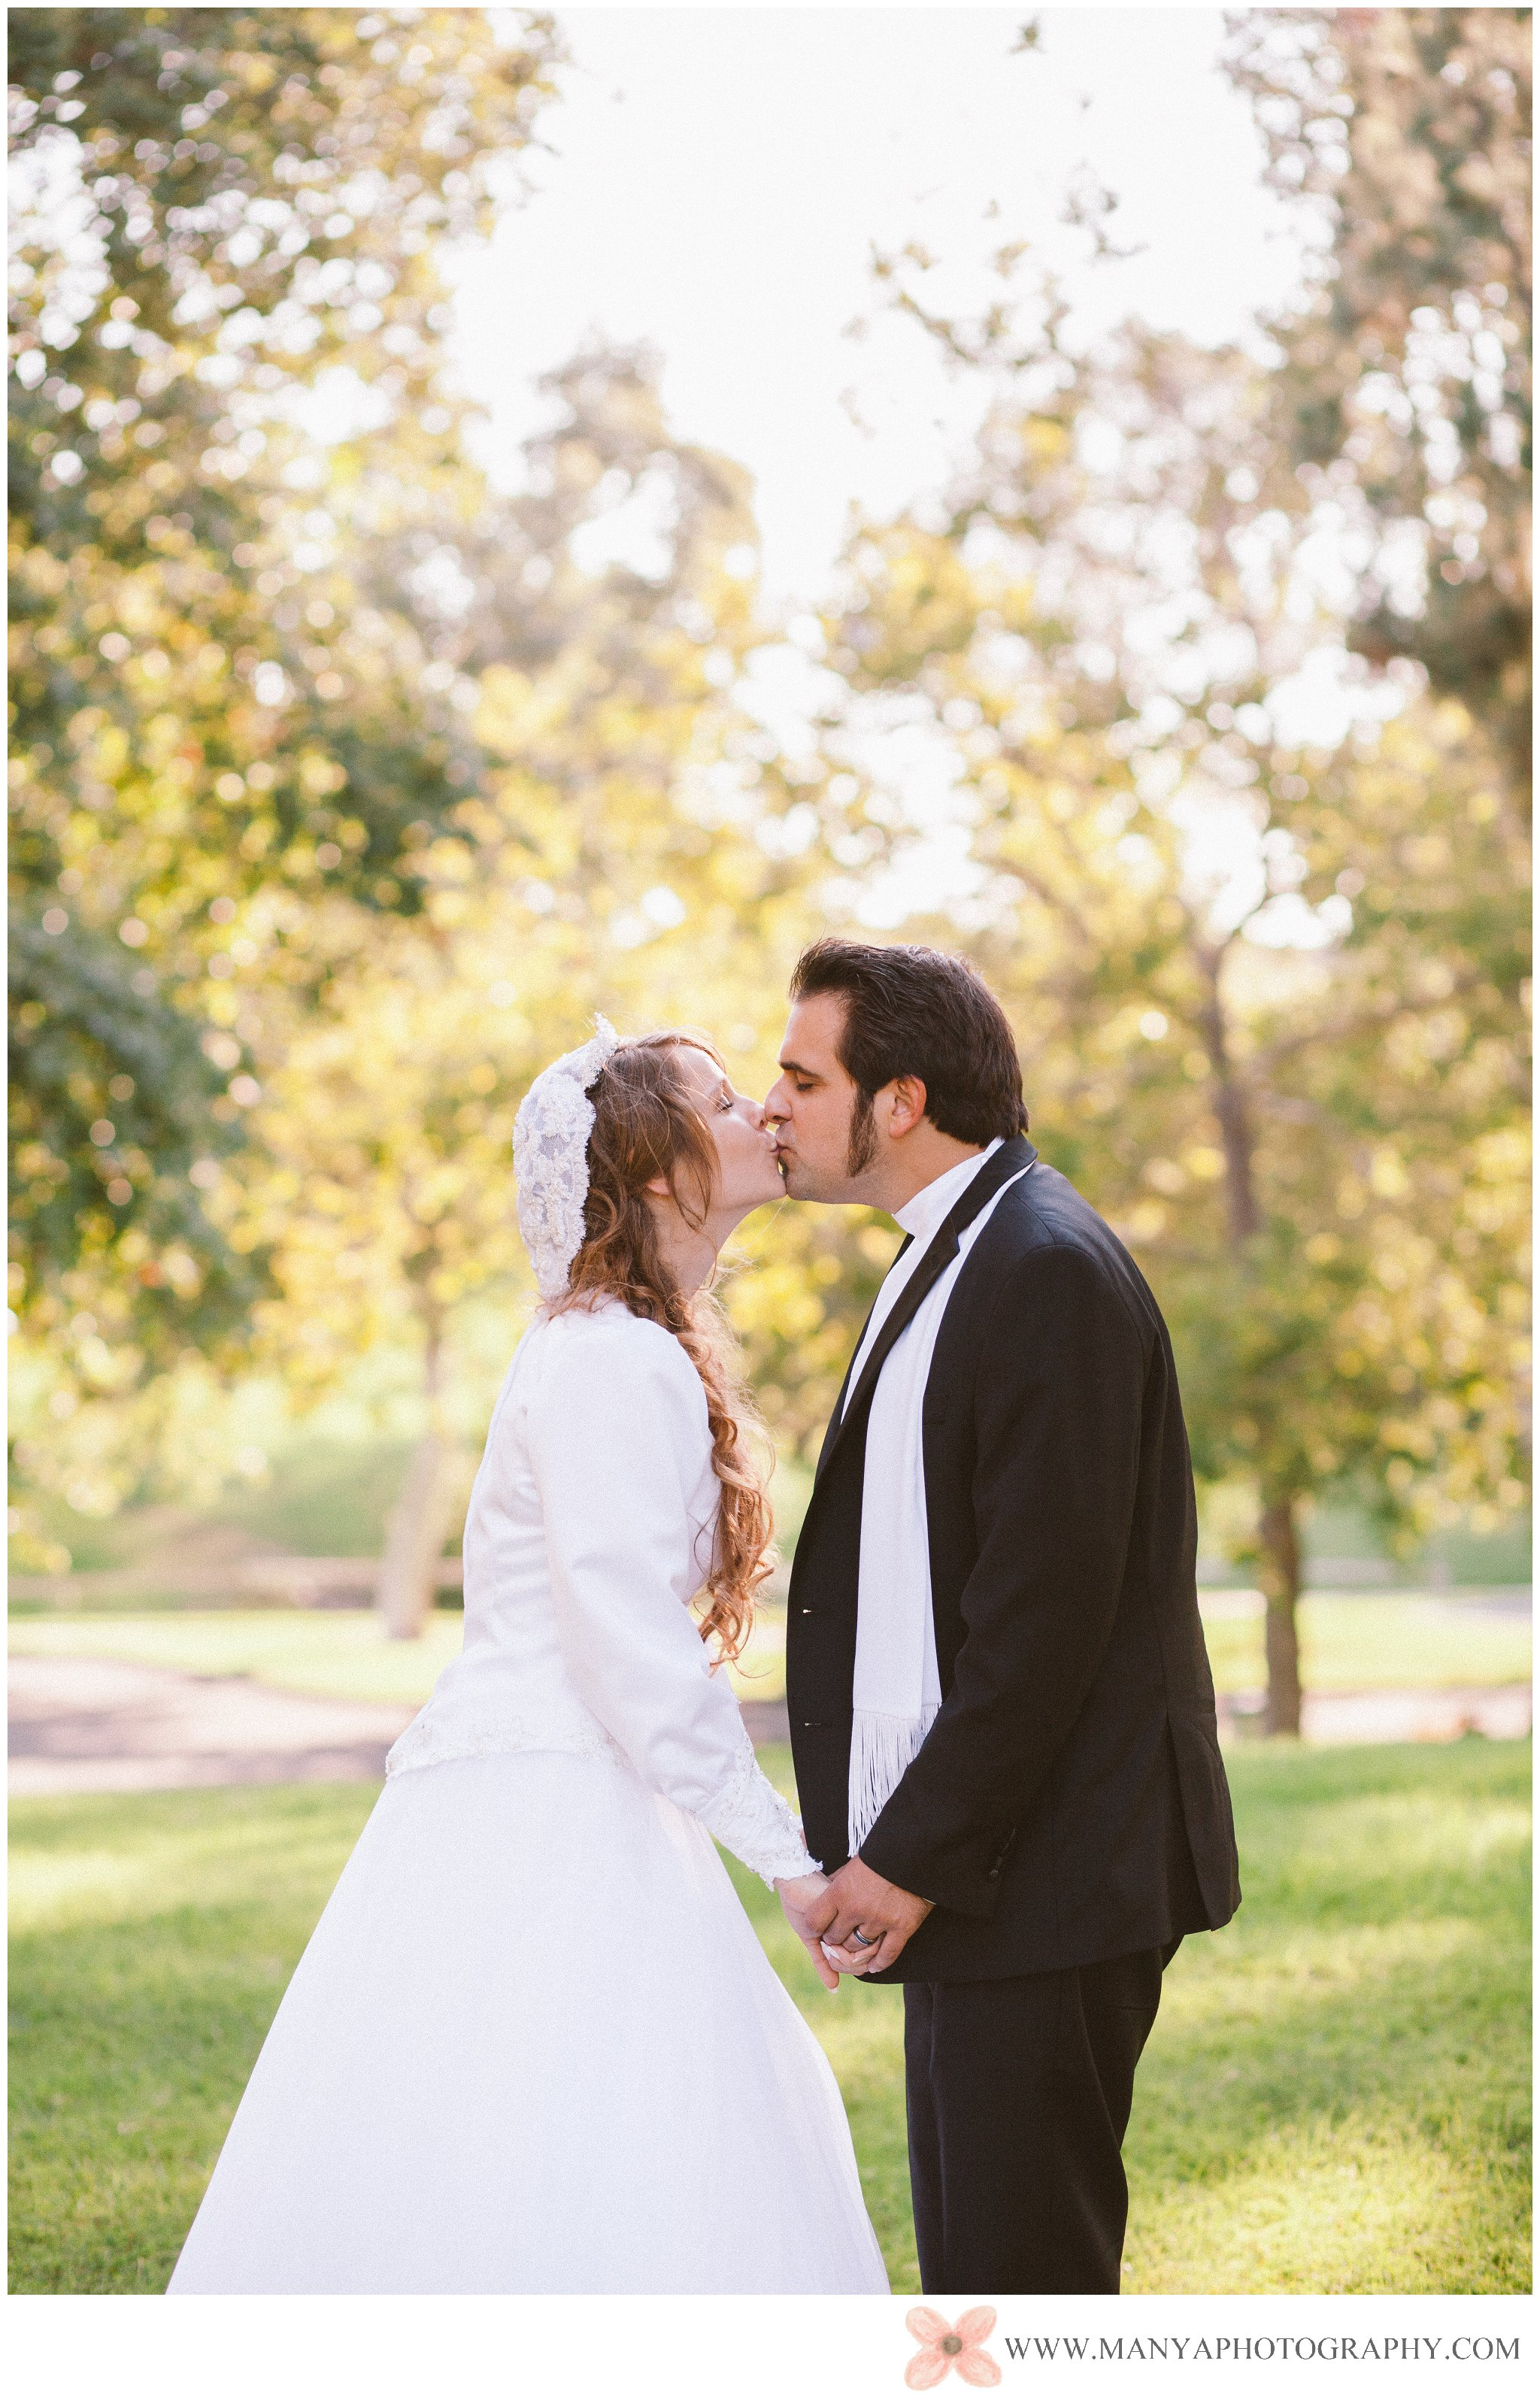 2013-10-16_0010 - Orange County Wedding Photographer